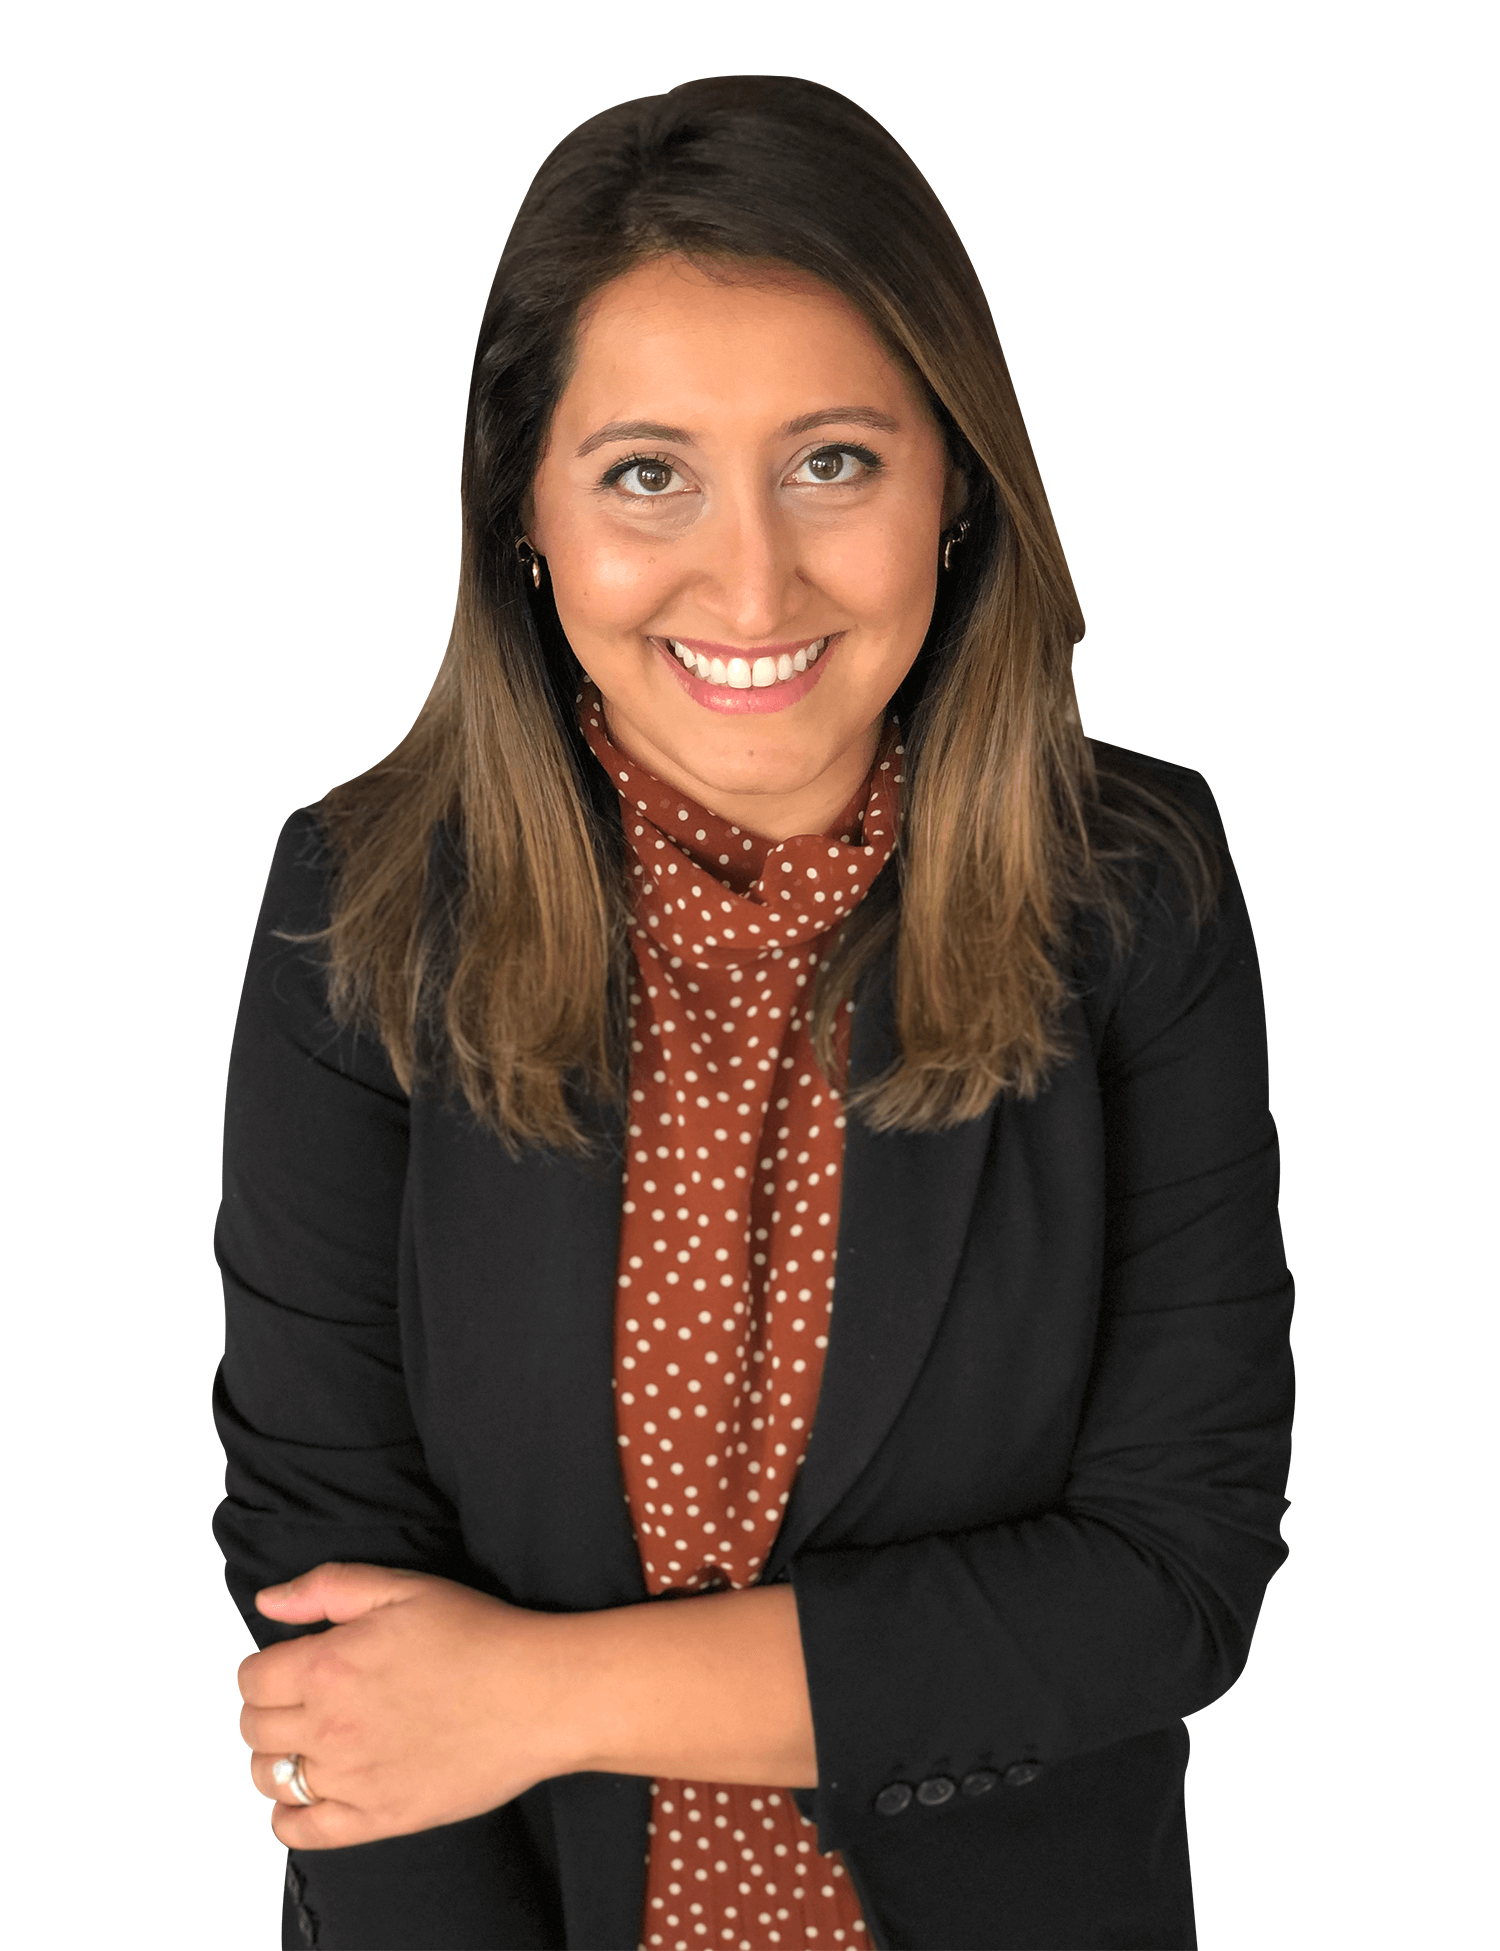 Hiba Weber